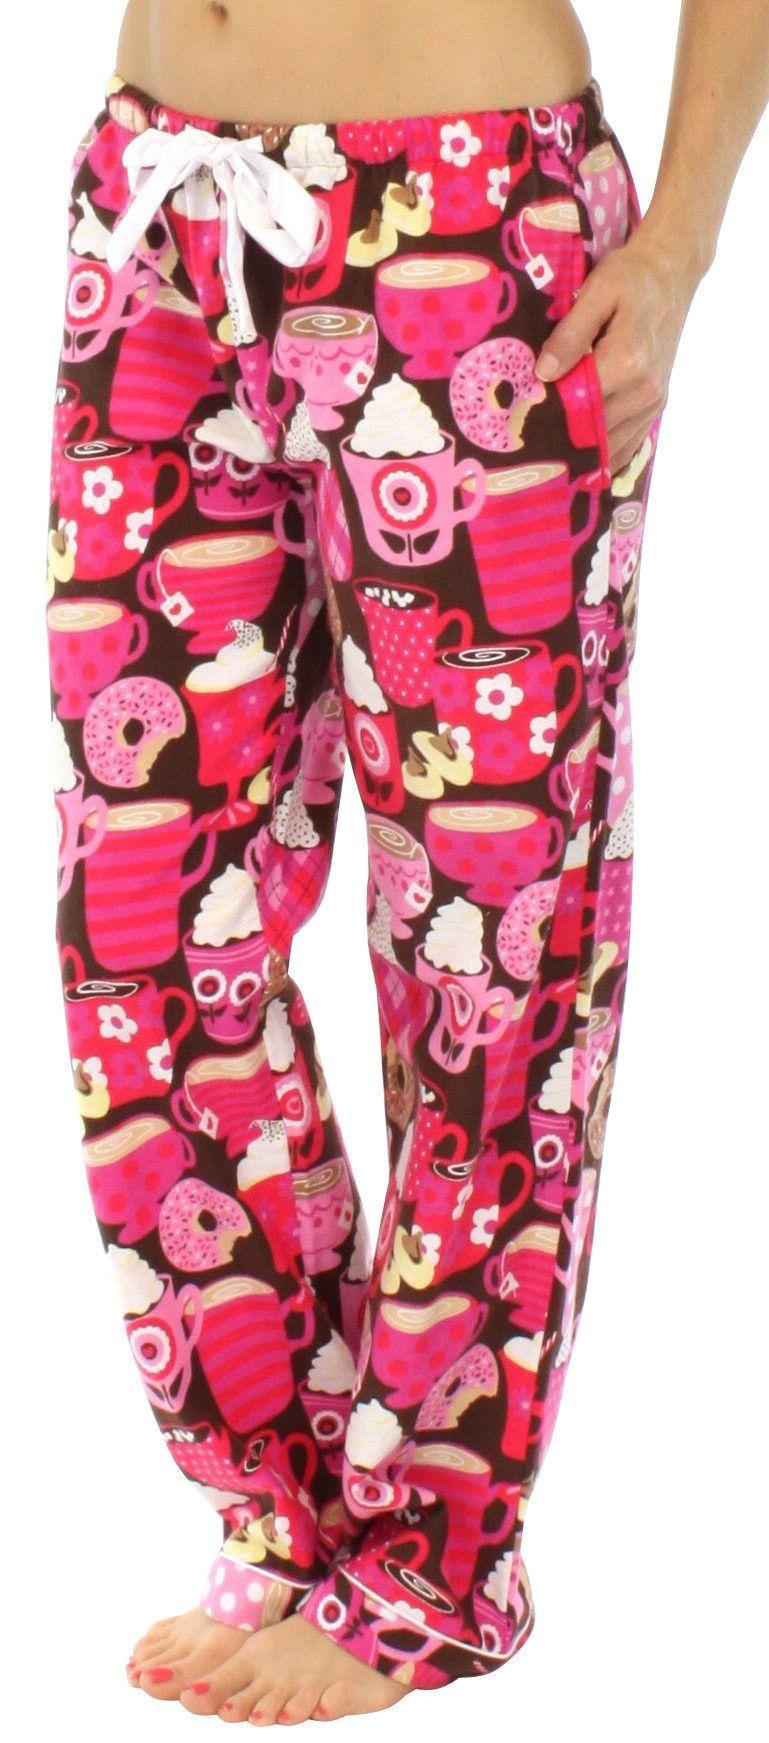 Flannel cardigan womens  PajamaMania Womenus Flannel Pajama Pants  Fashion  Pinterest